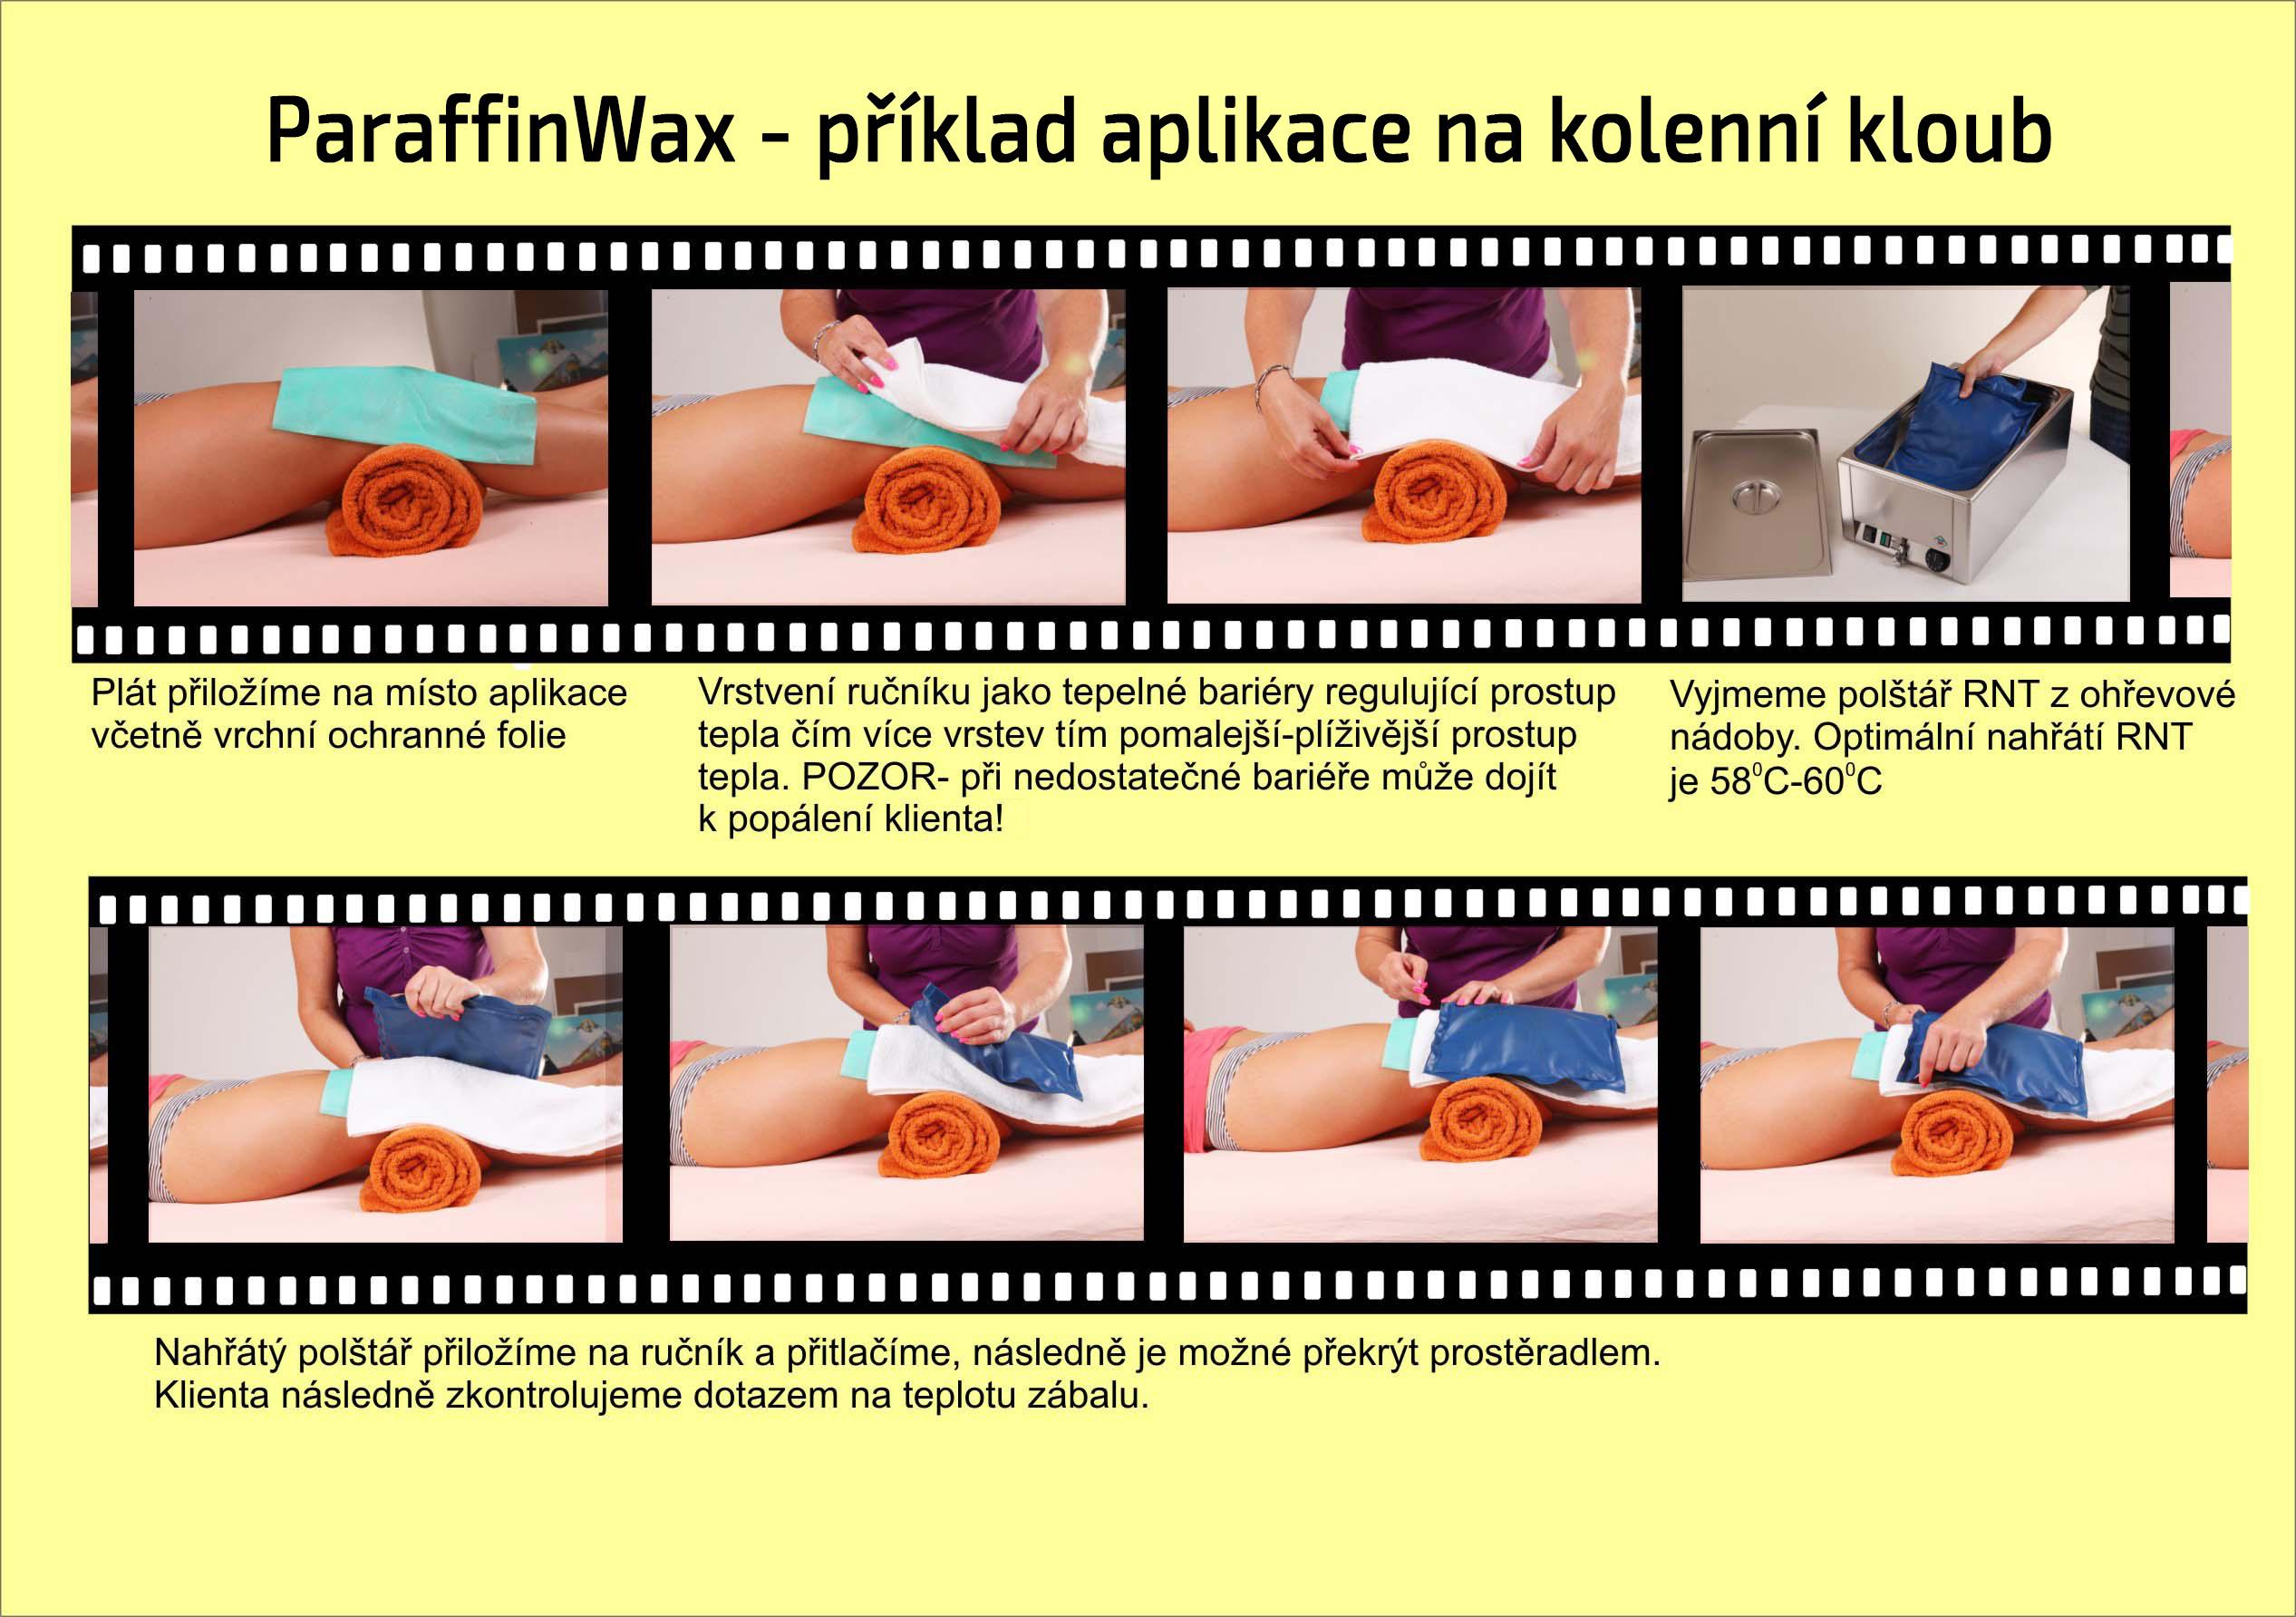 Aplikace Paraffinwax